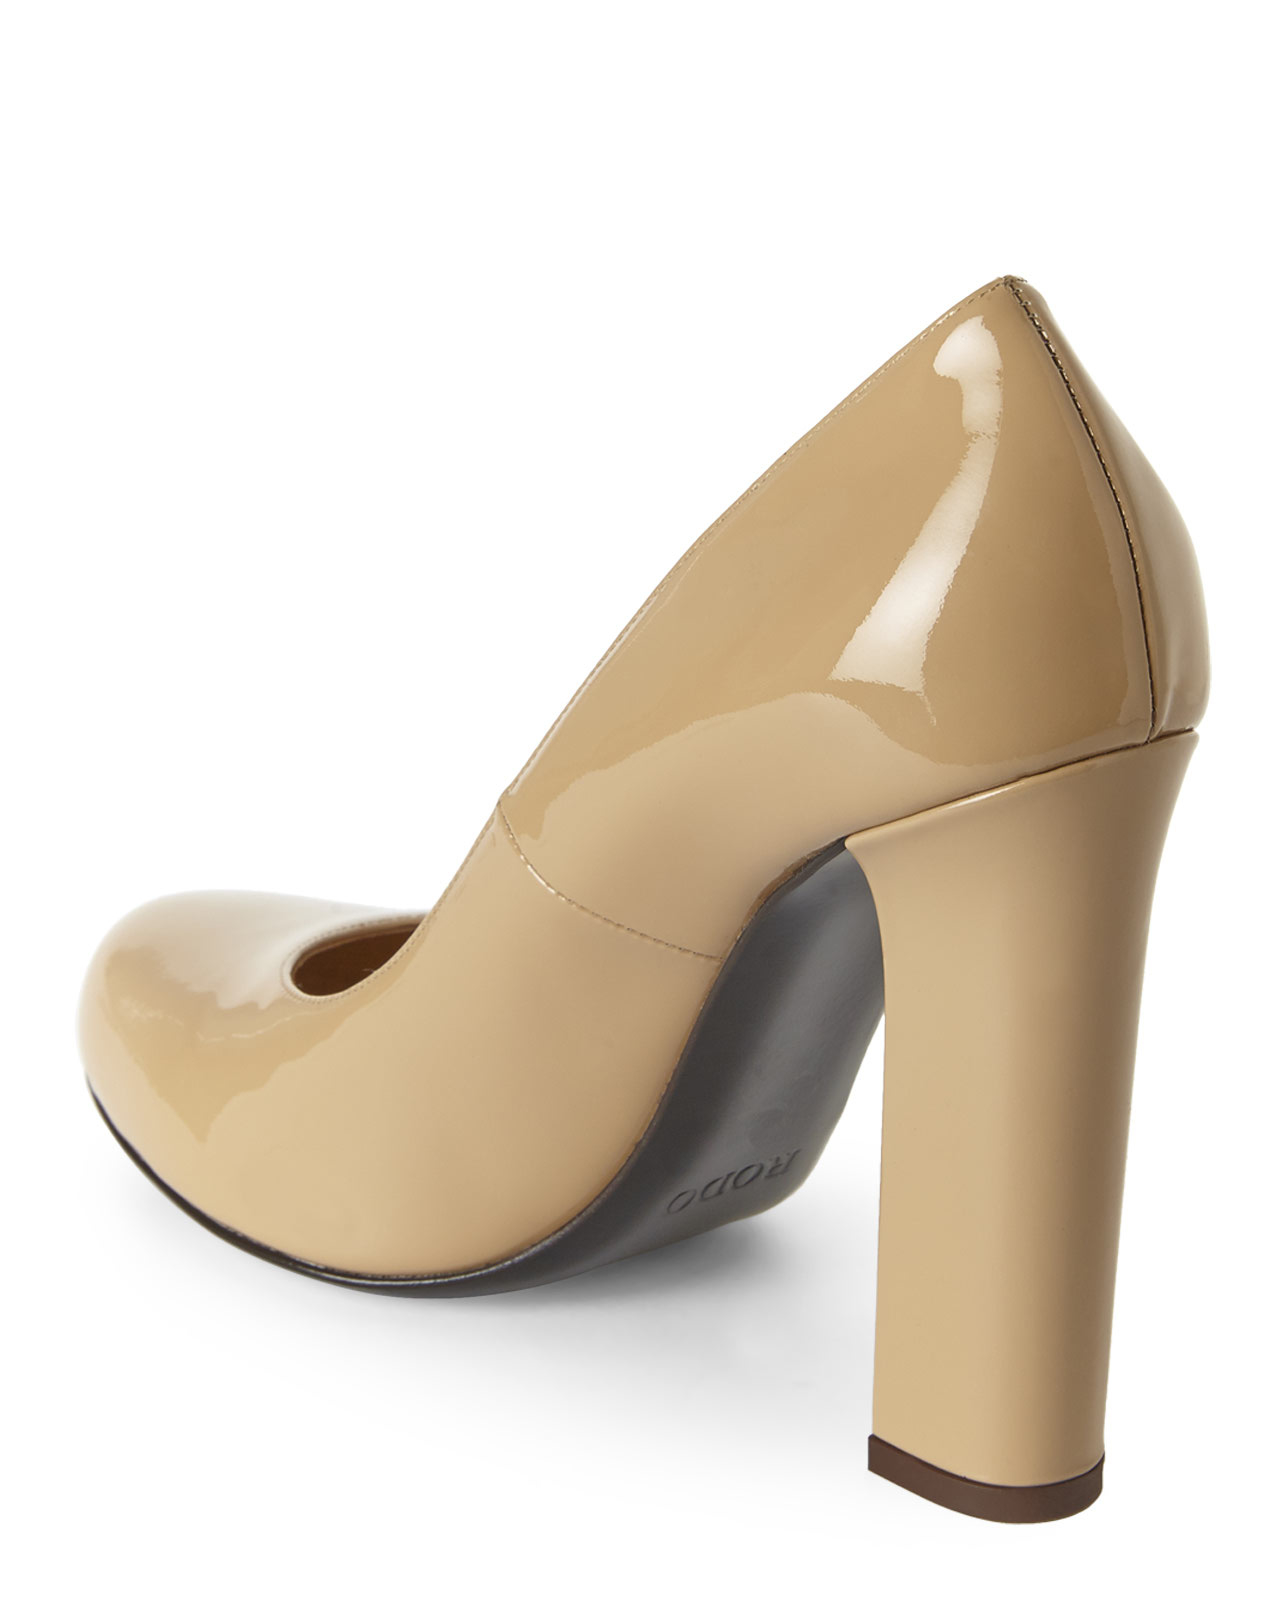 ede69261166 Lyst - Rodo Nude Block Heel Pumps in Natural